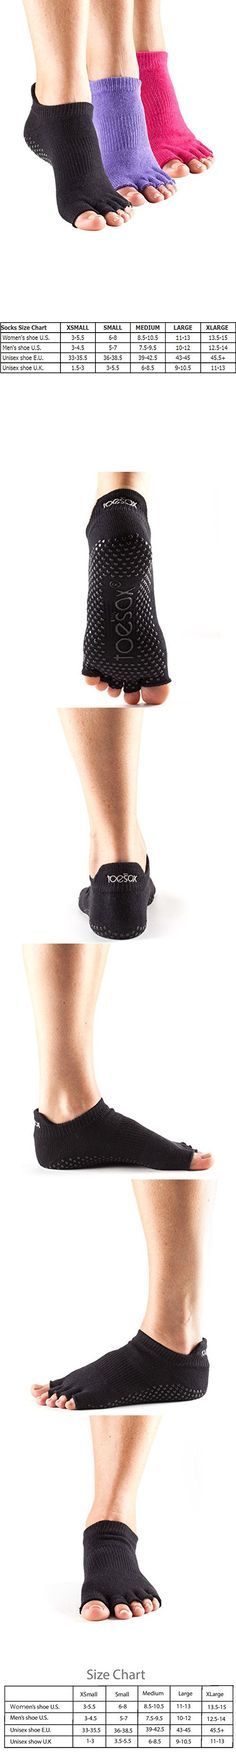 ToeSox Half Toe Low Rise Grip Pilates Barre Socks 3 Pk (Black/Fuchsia/Purple, M)